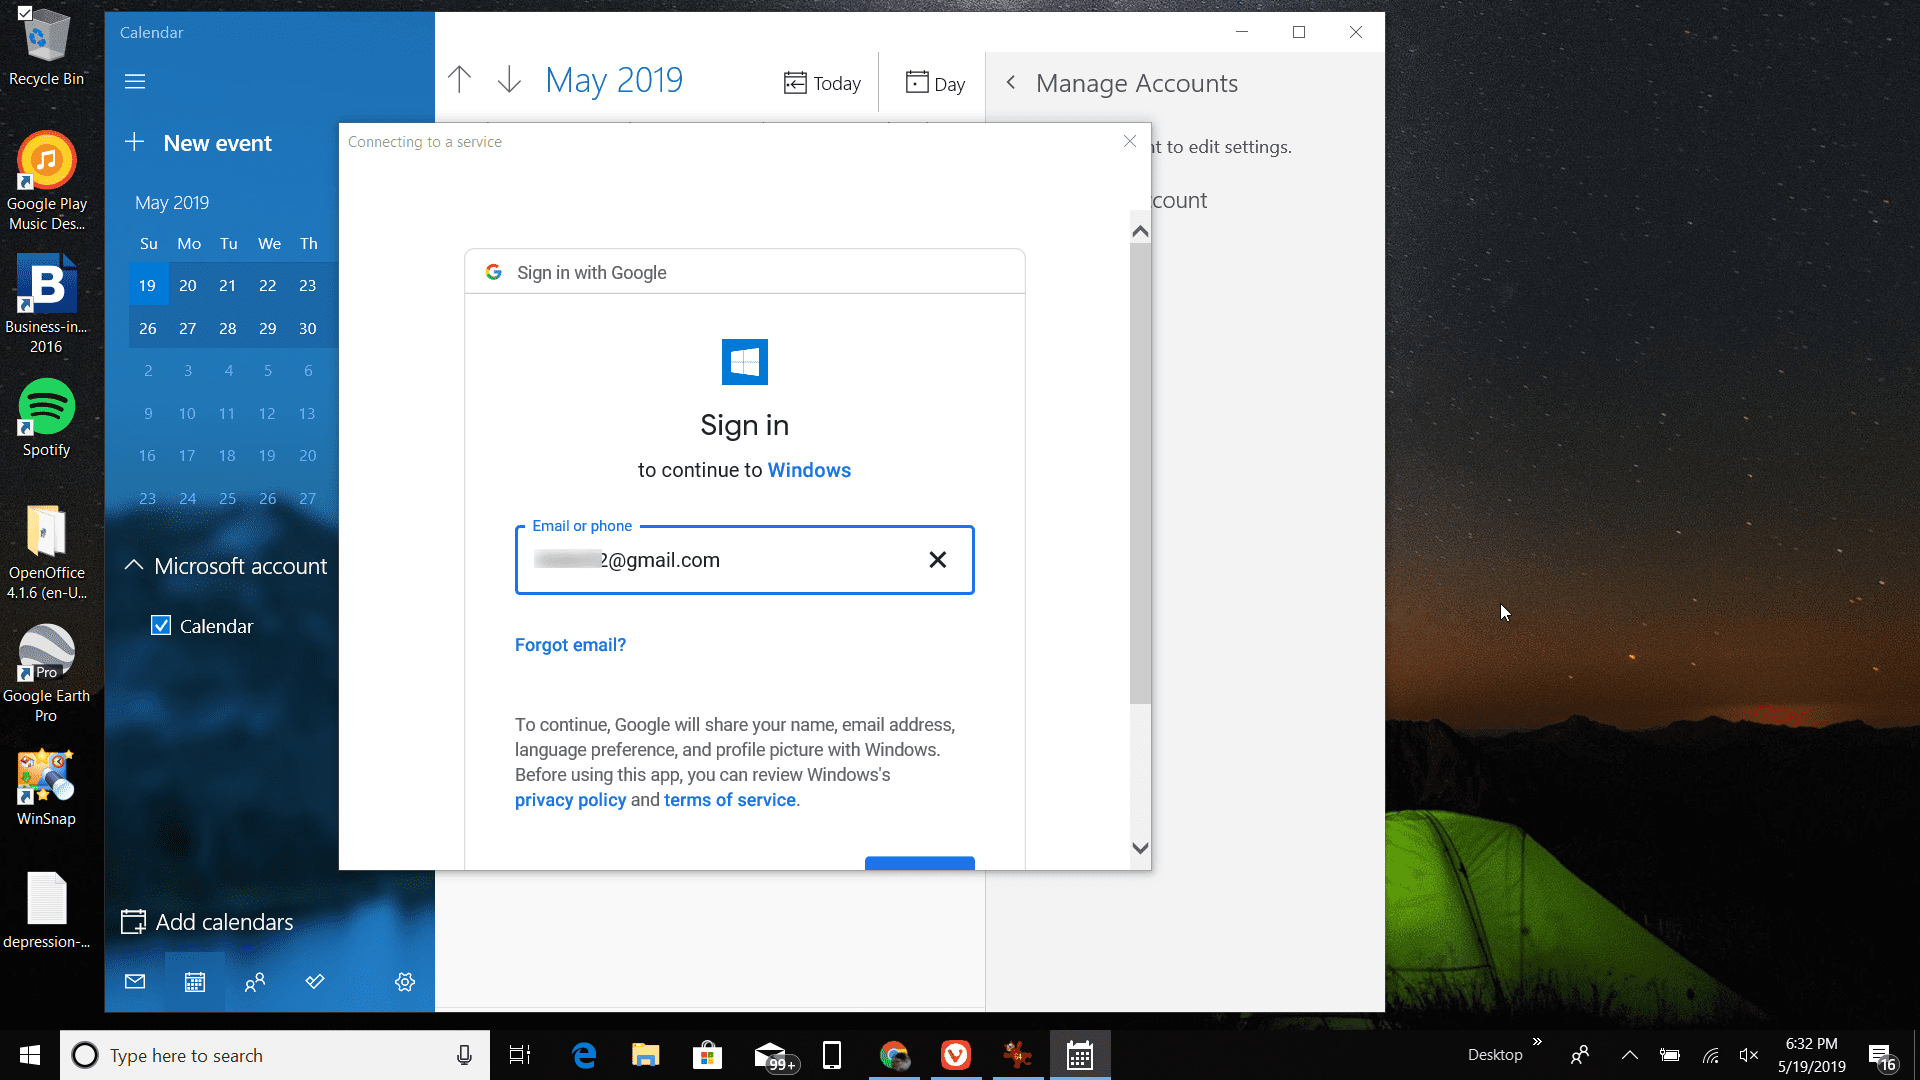 How To Get Google Calendar On Your Windows Desktop inside Calendar Widget For Windows 10